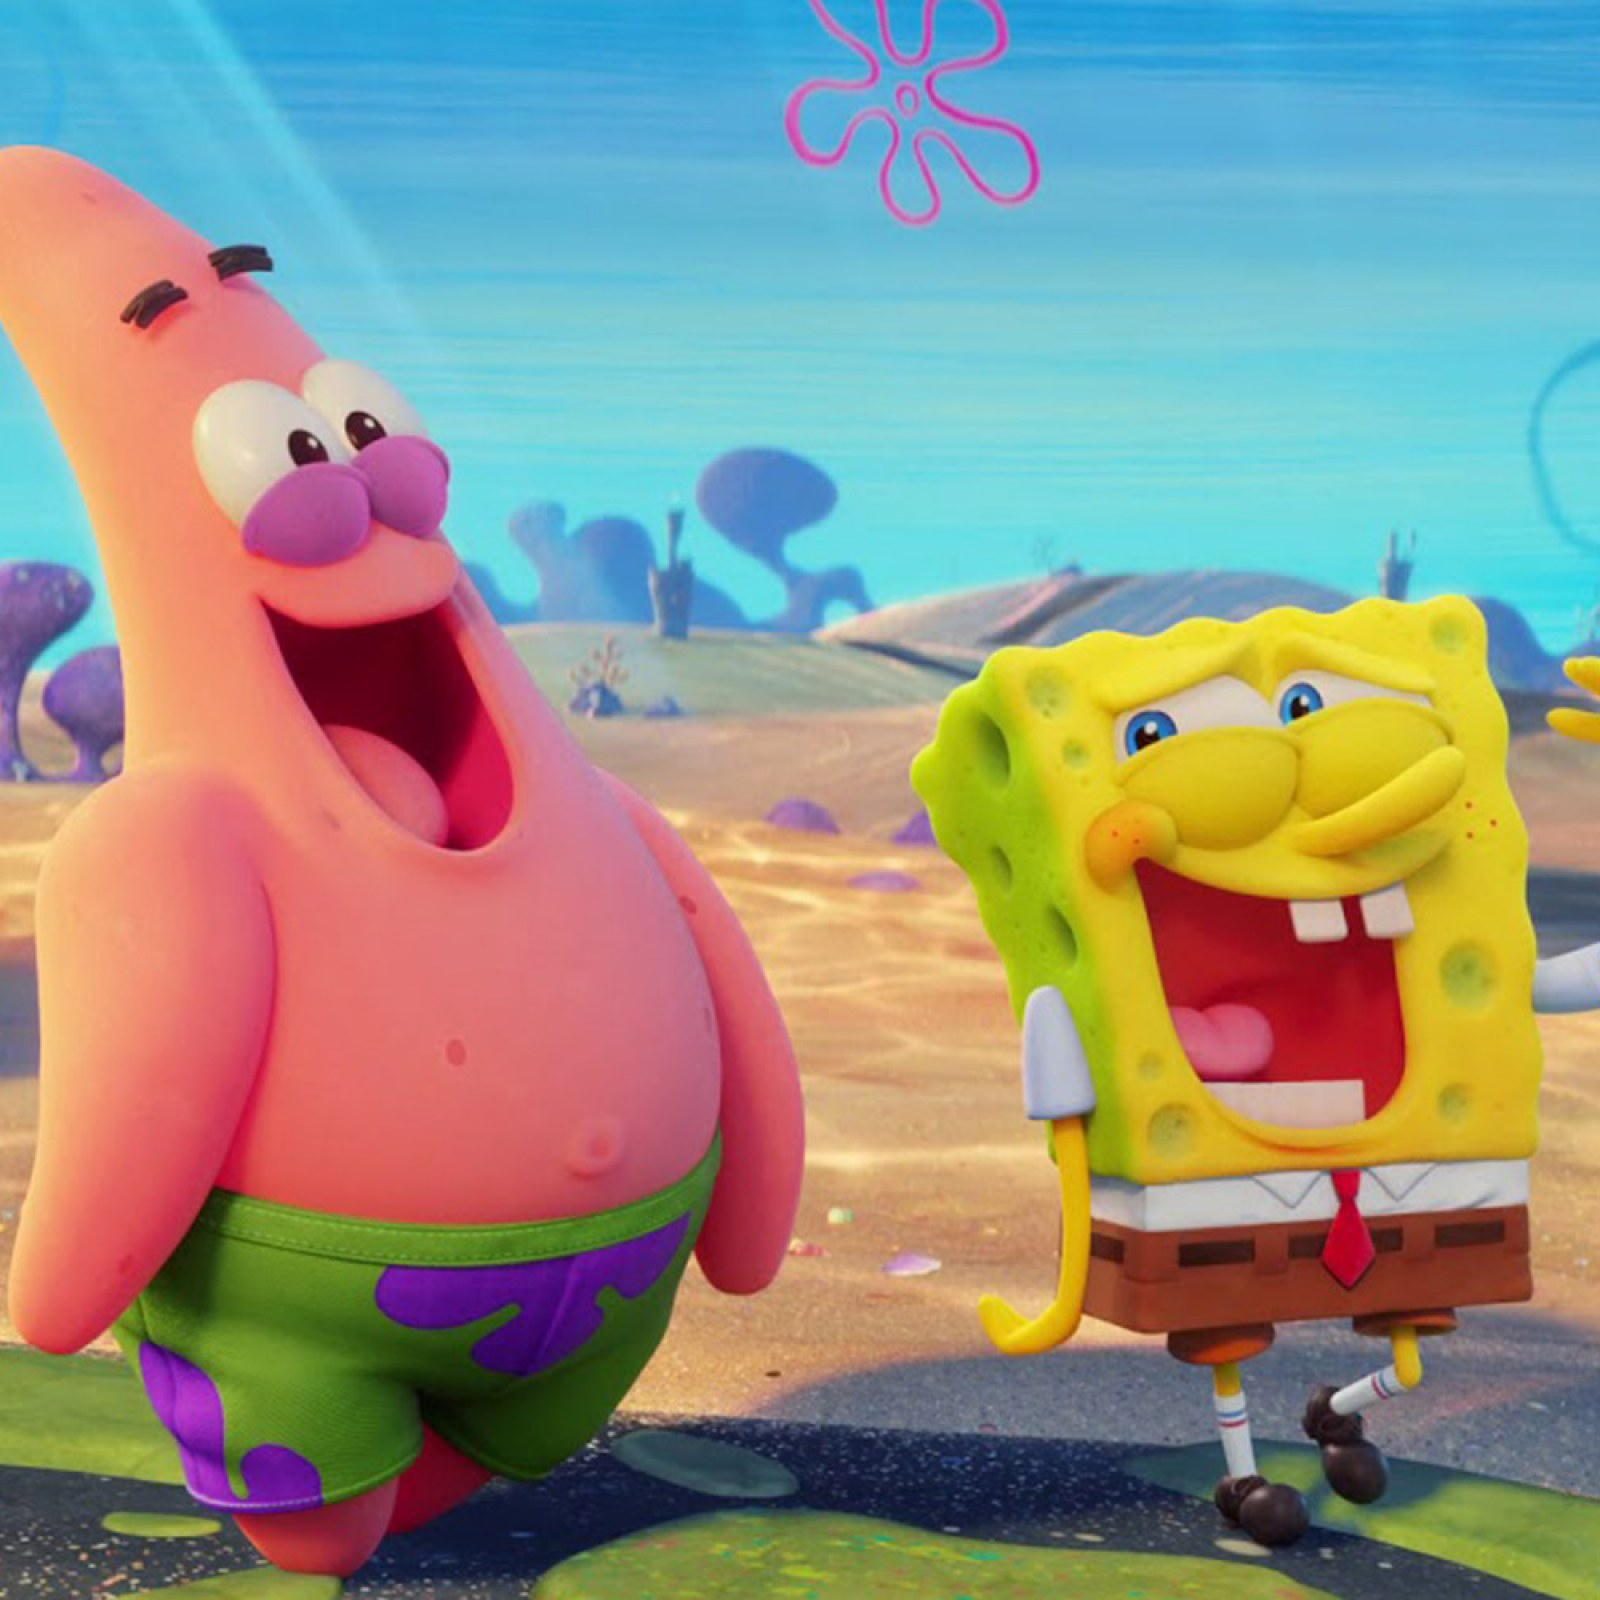 Spongebob Movie Streaming How To Watch Sponge On The Run Online